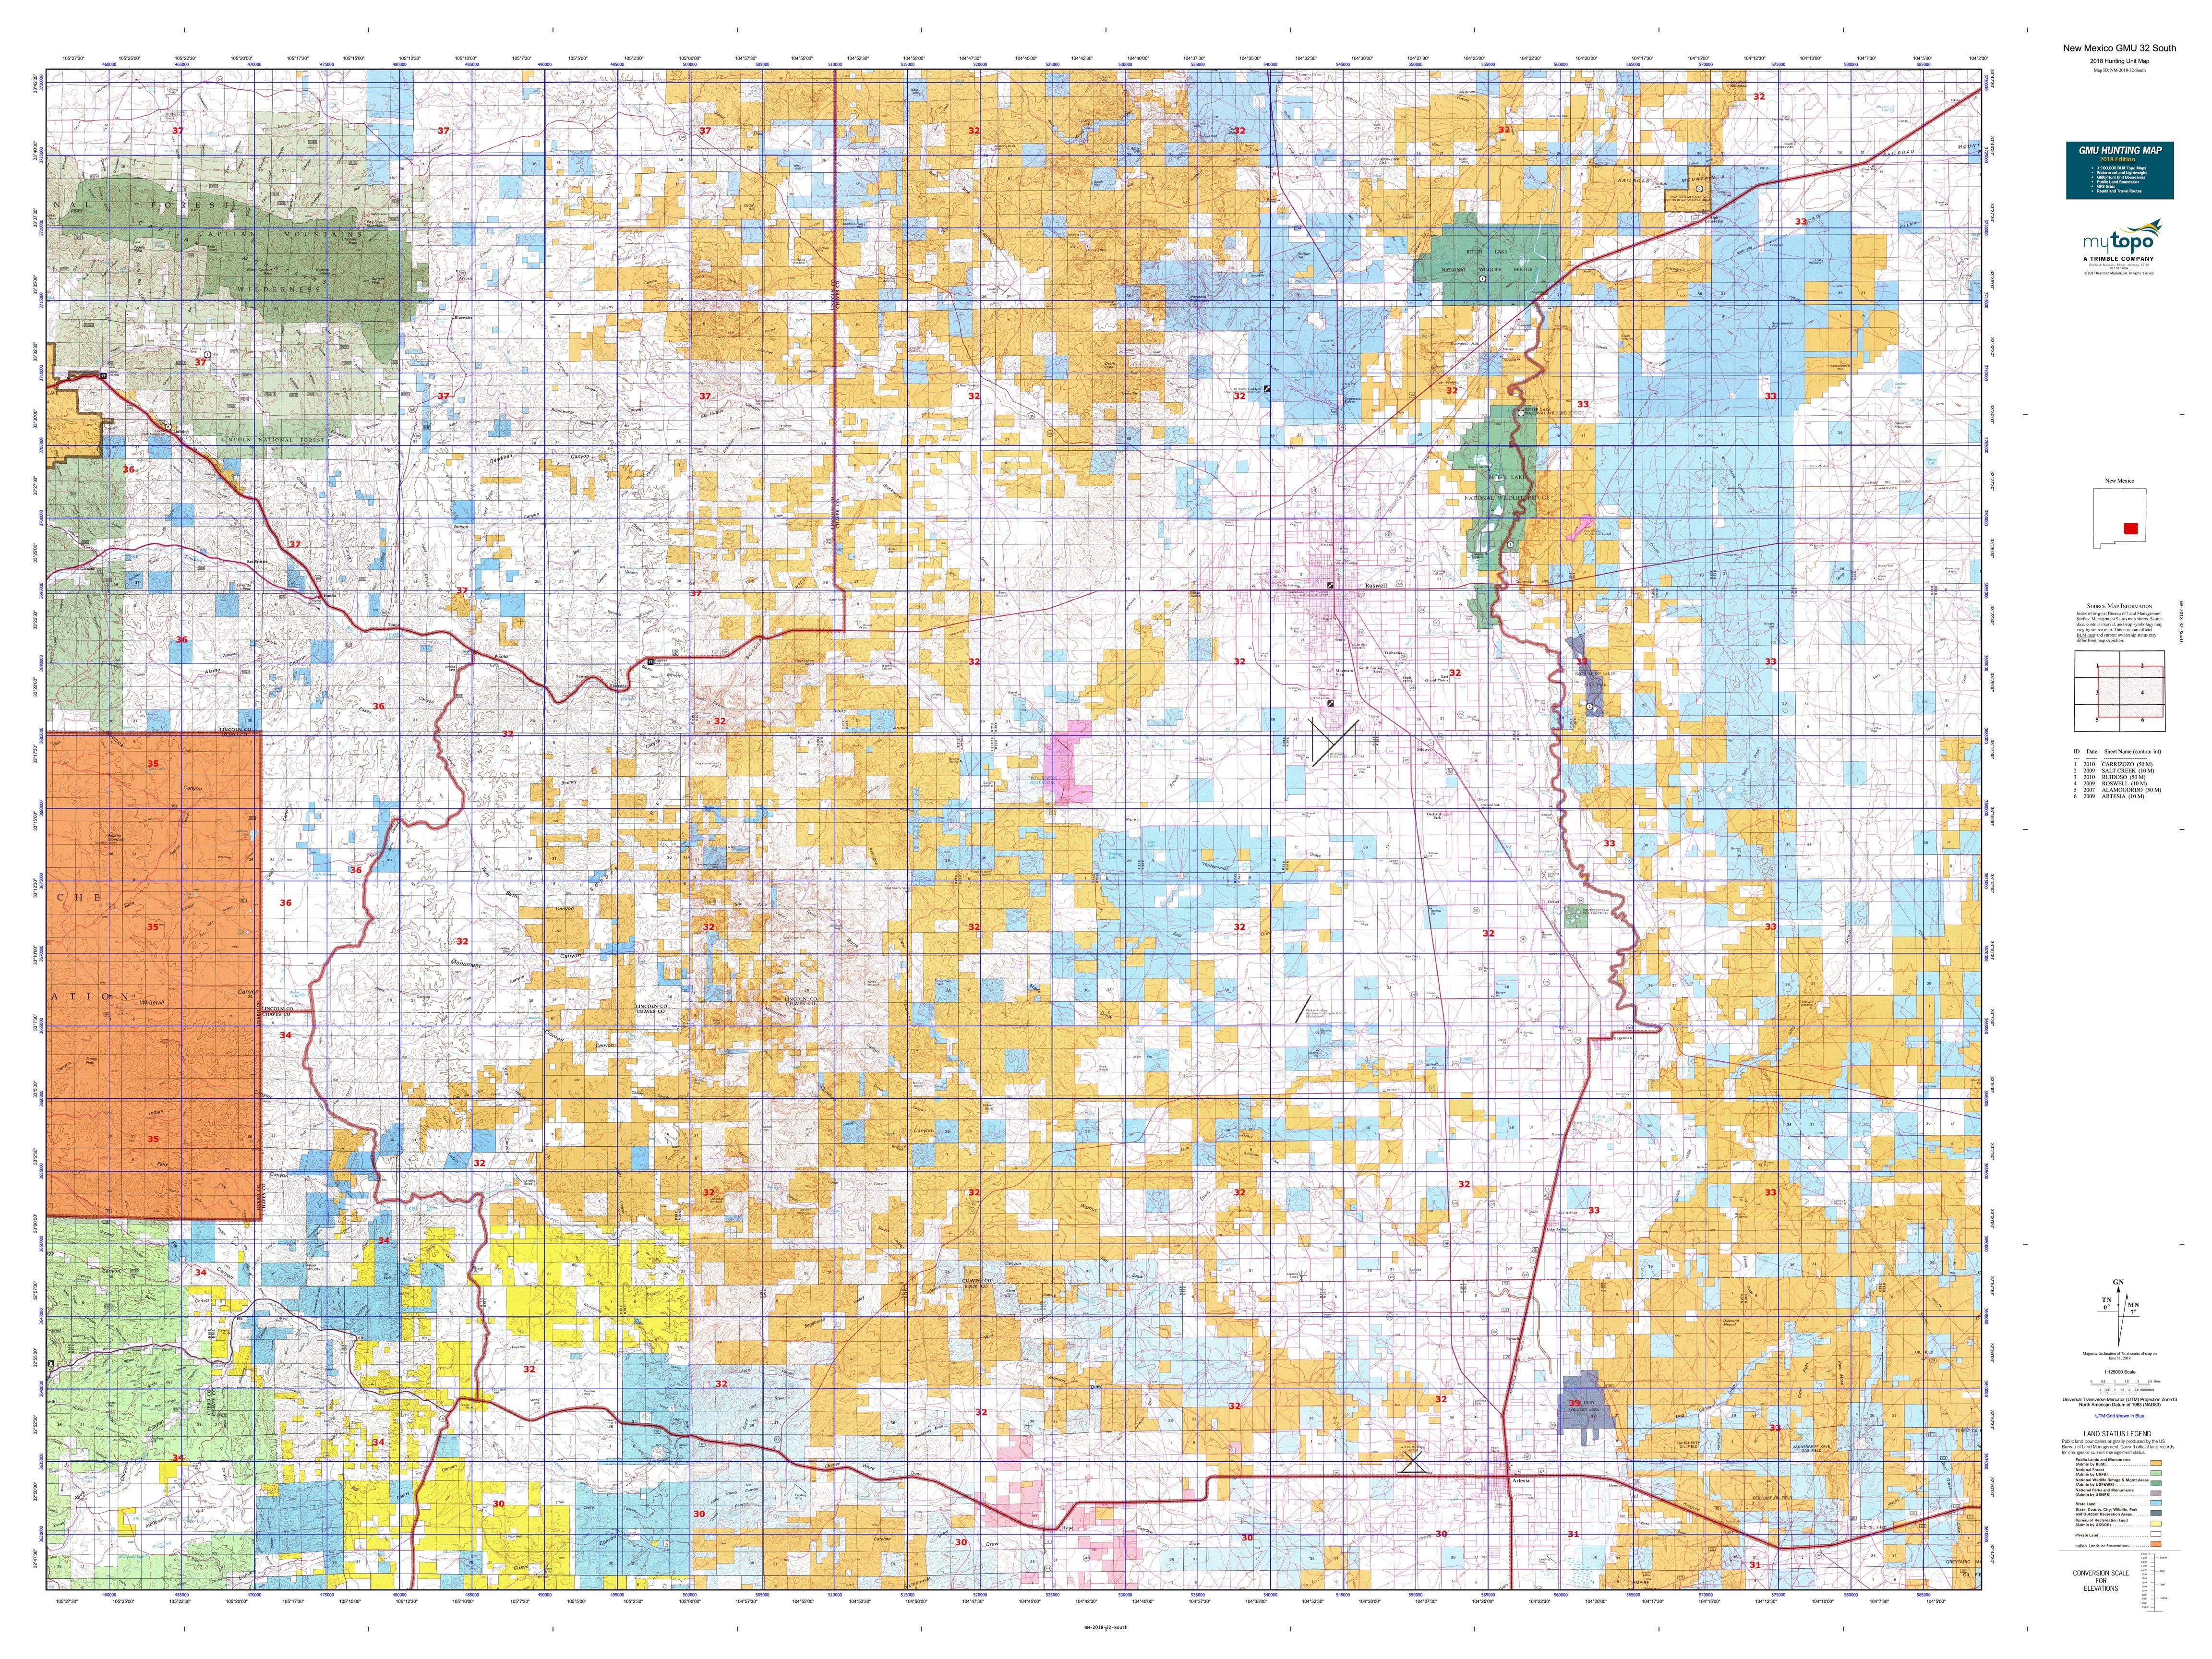 North New Mexico Map.New Mexico Gmu 32 South Map Mytopo